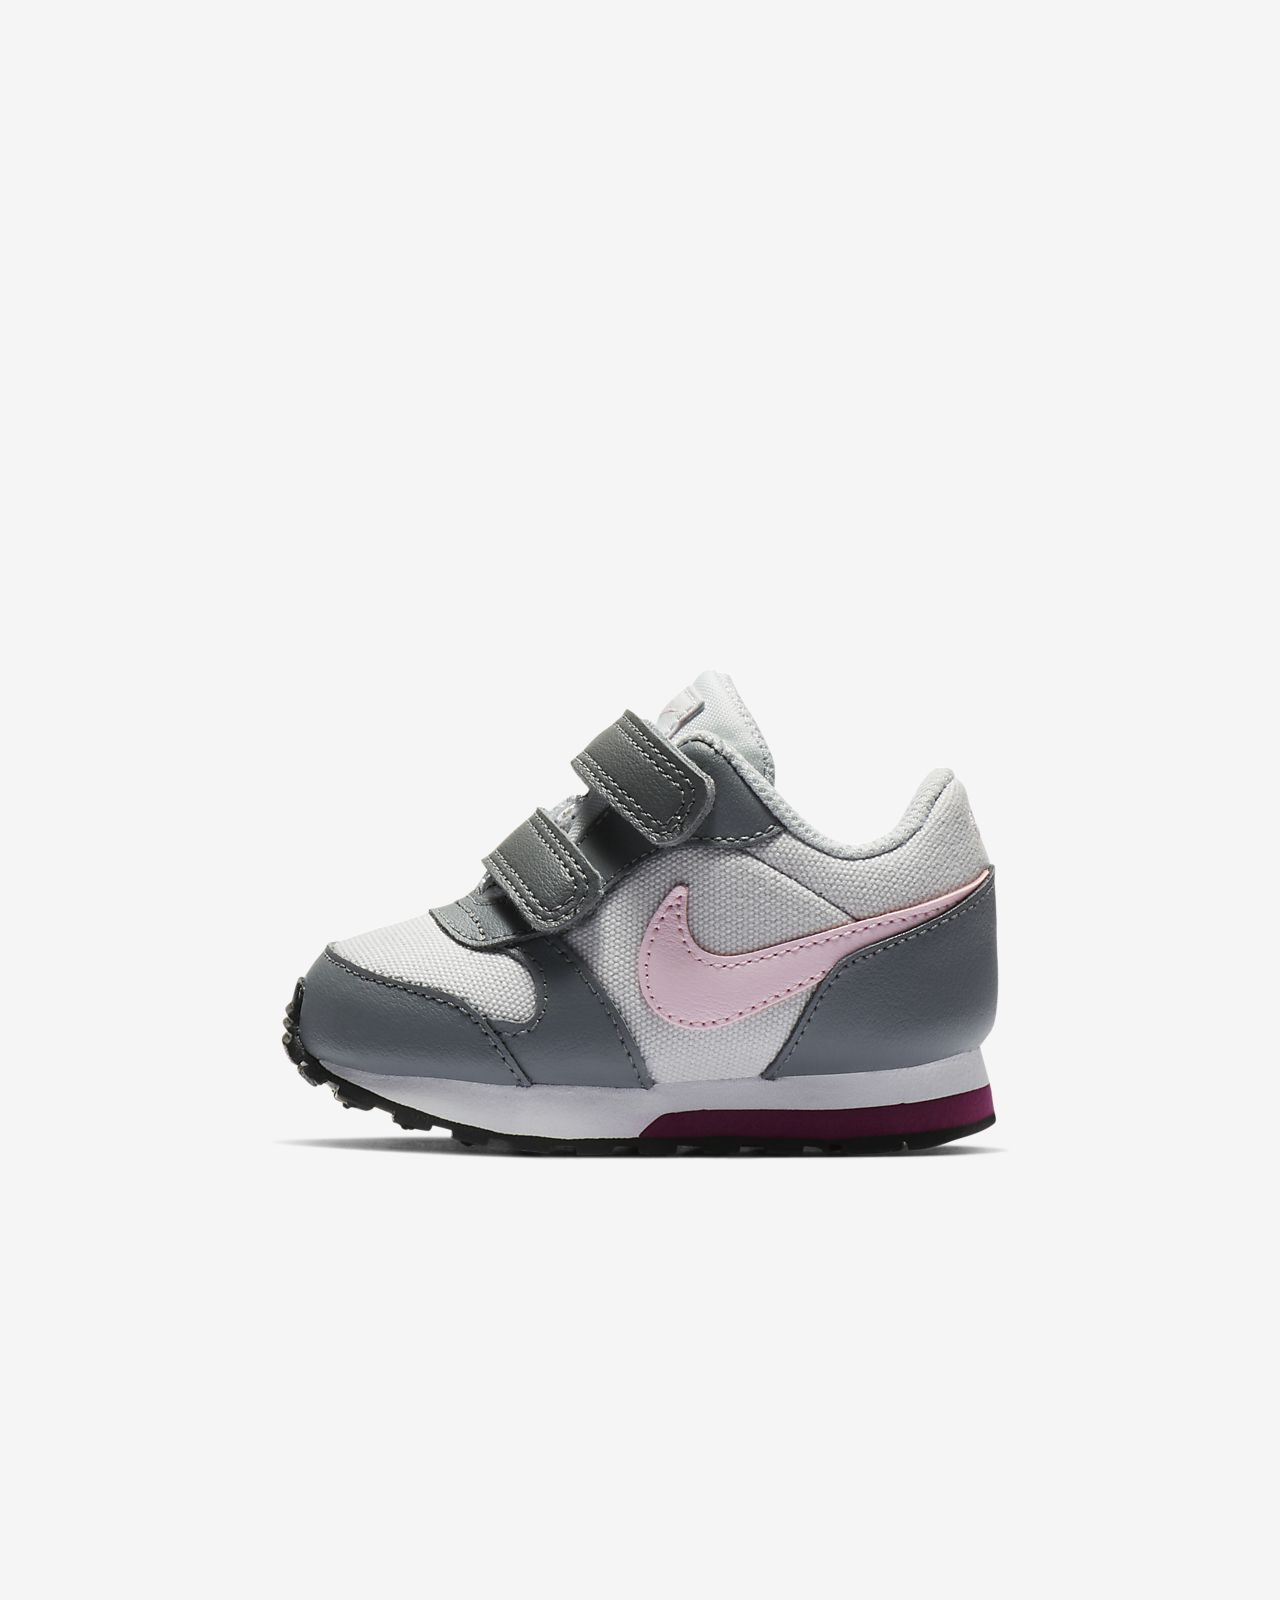 73ae89e88 Nike MD Runner 2 Zapatillas - Bebé e infantil. Nike.com ES